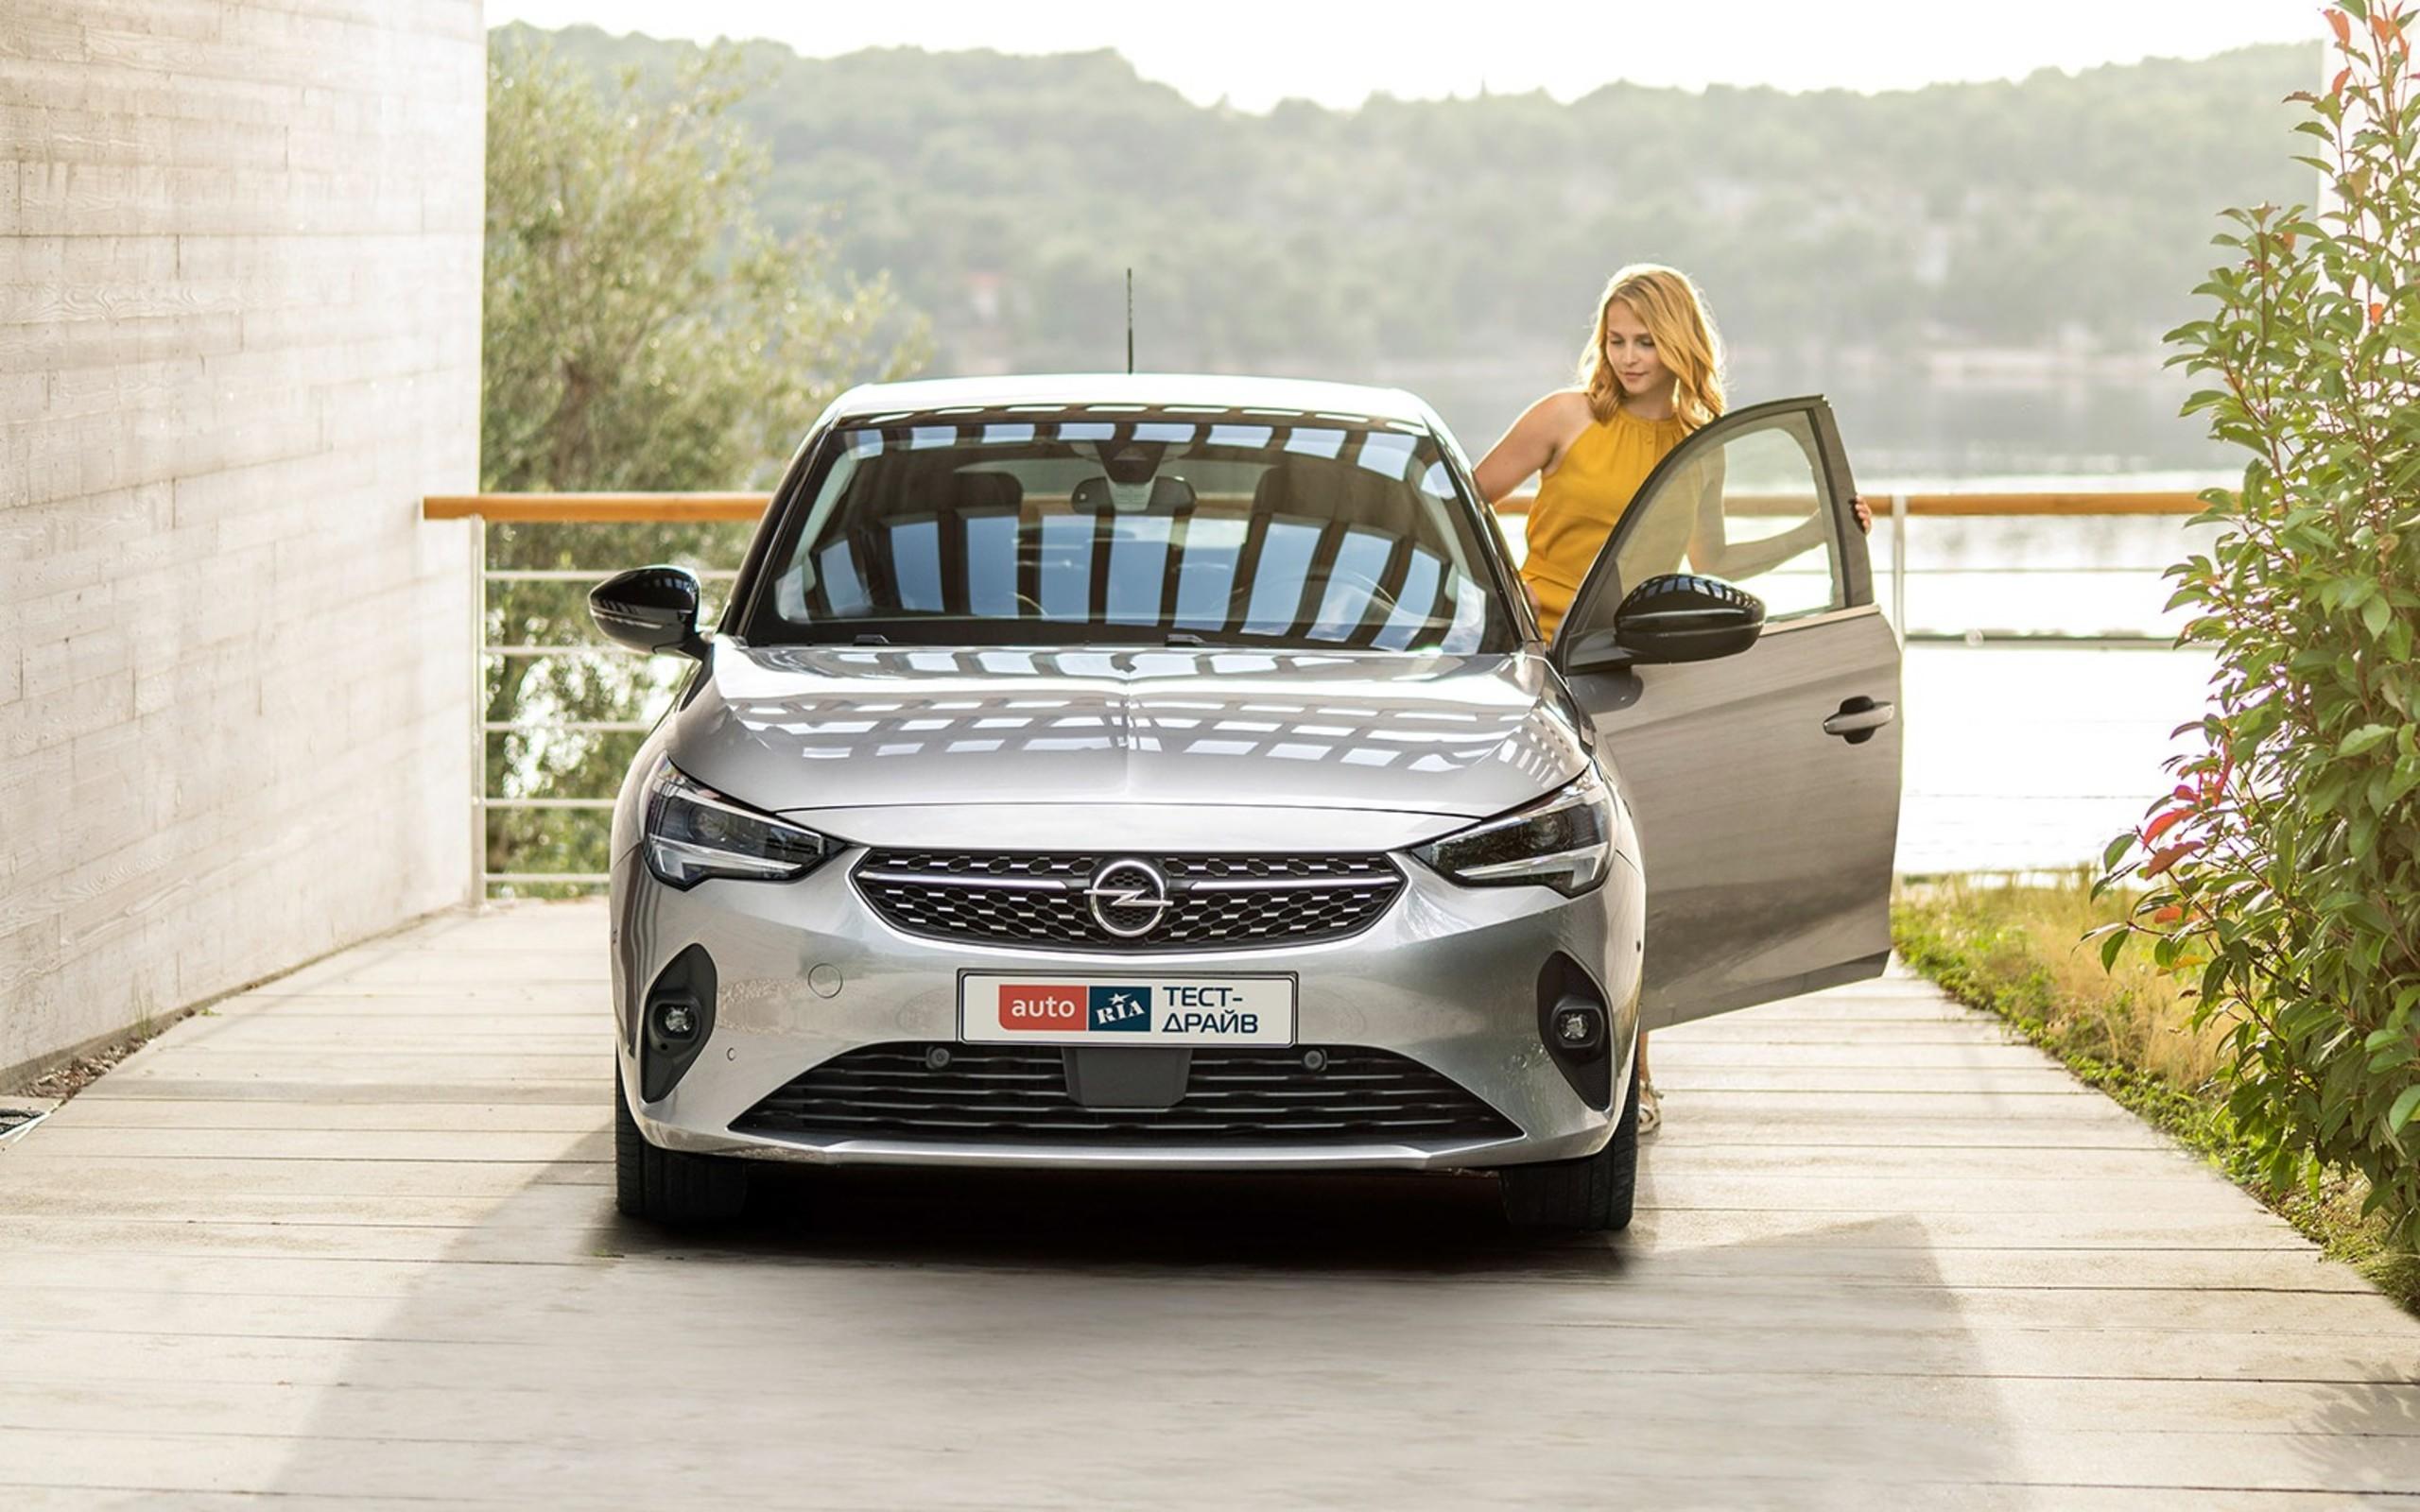 Opel Corsa F: Немецкий перевод